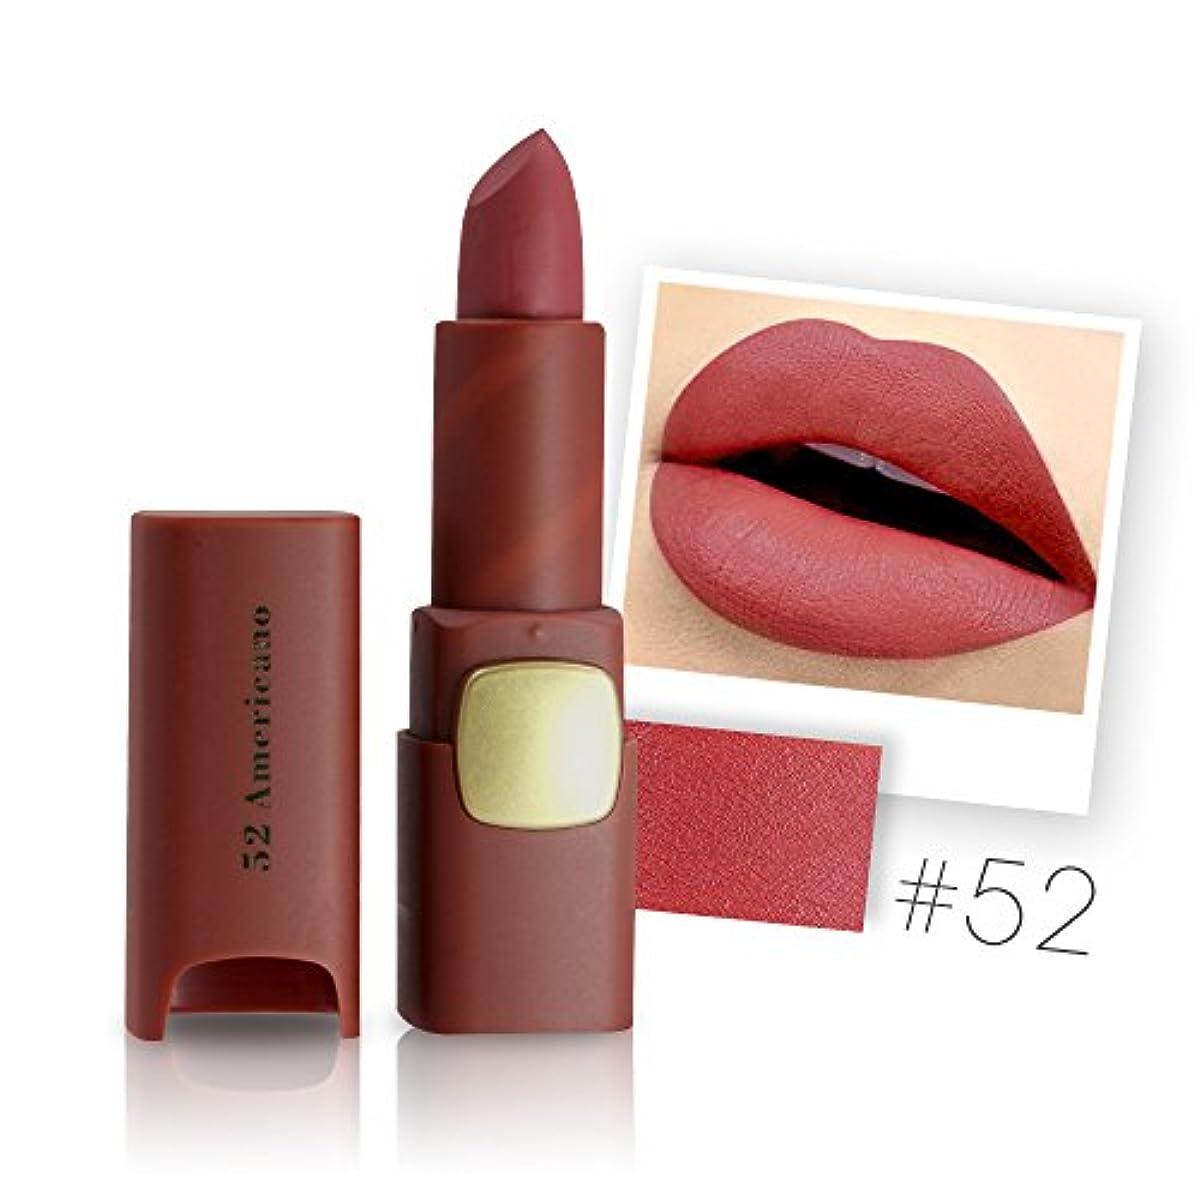 急速な不利益種類Miss Rose Brand Matte Lipstick Waterproof Lips Moisturizing Easy To Wear Makeup Lip Sticks Gloss Lipsticks Cosmetic